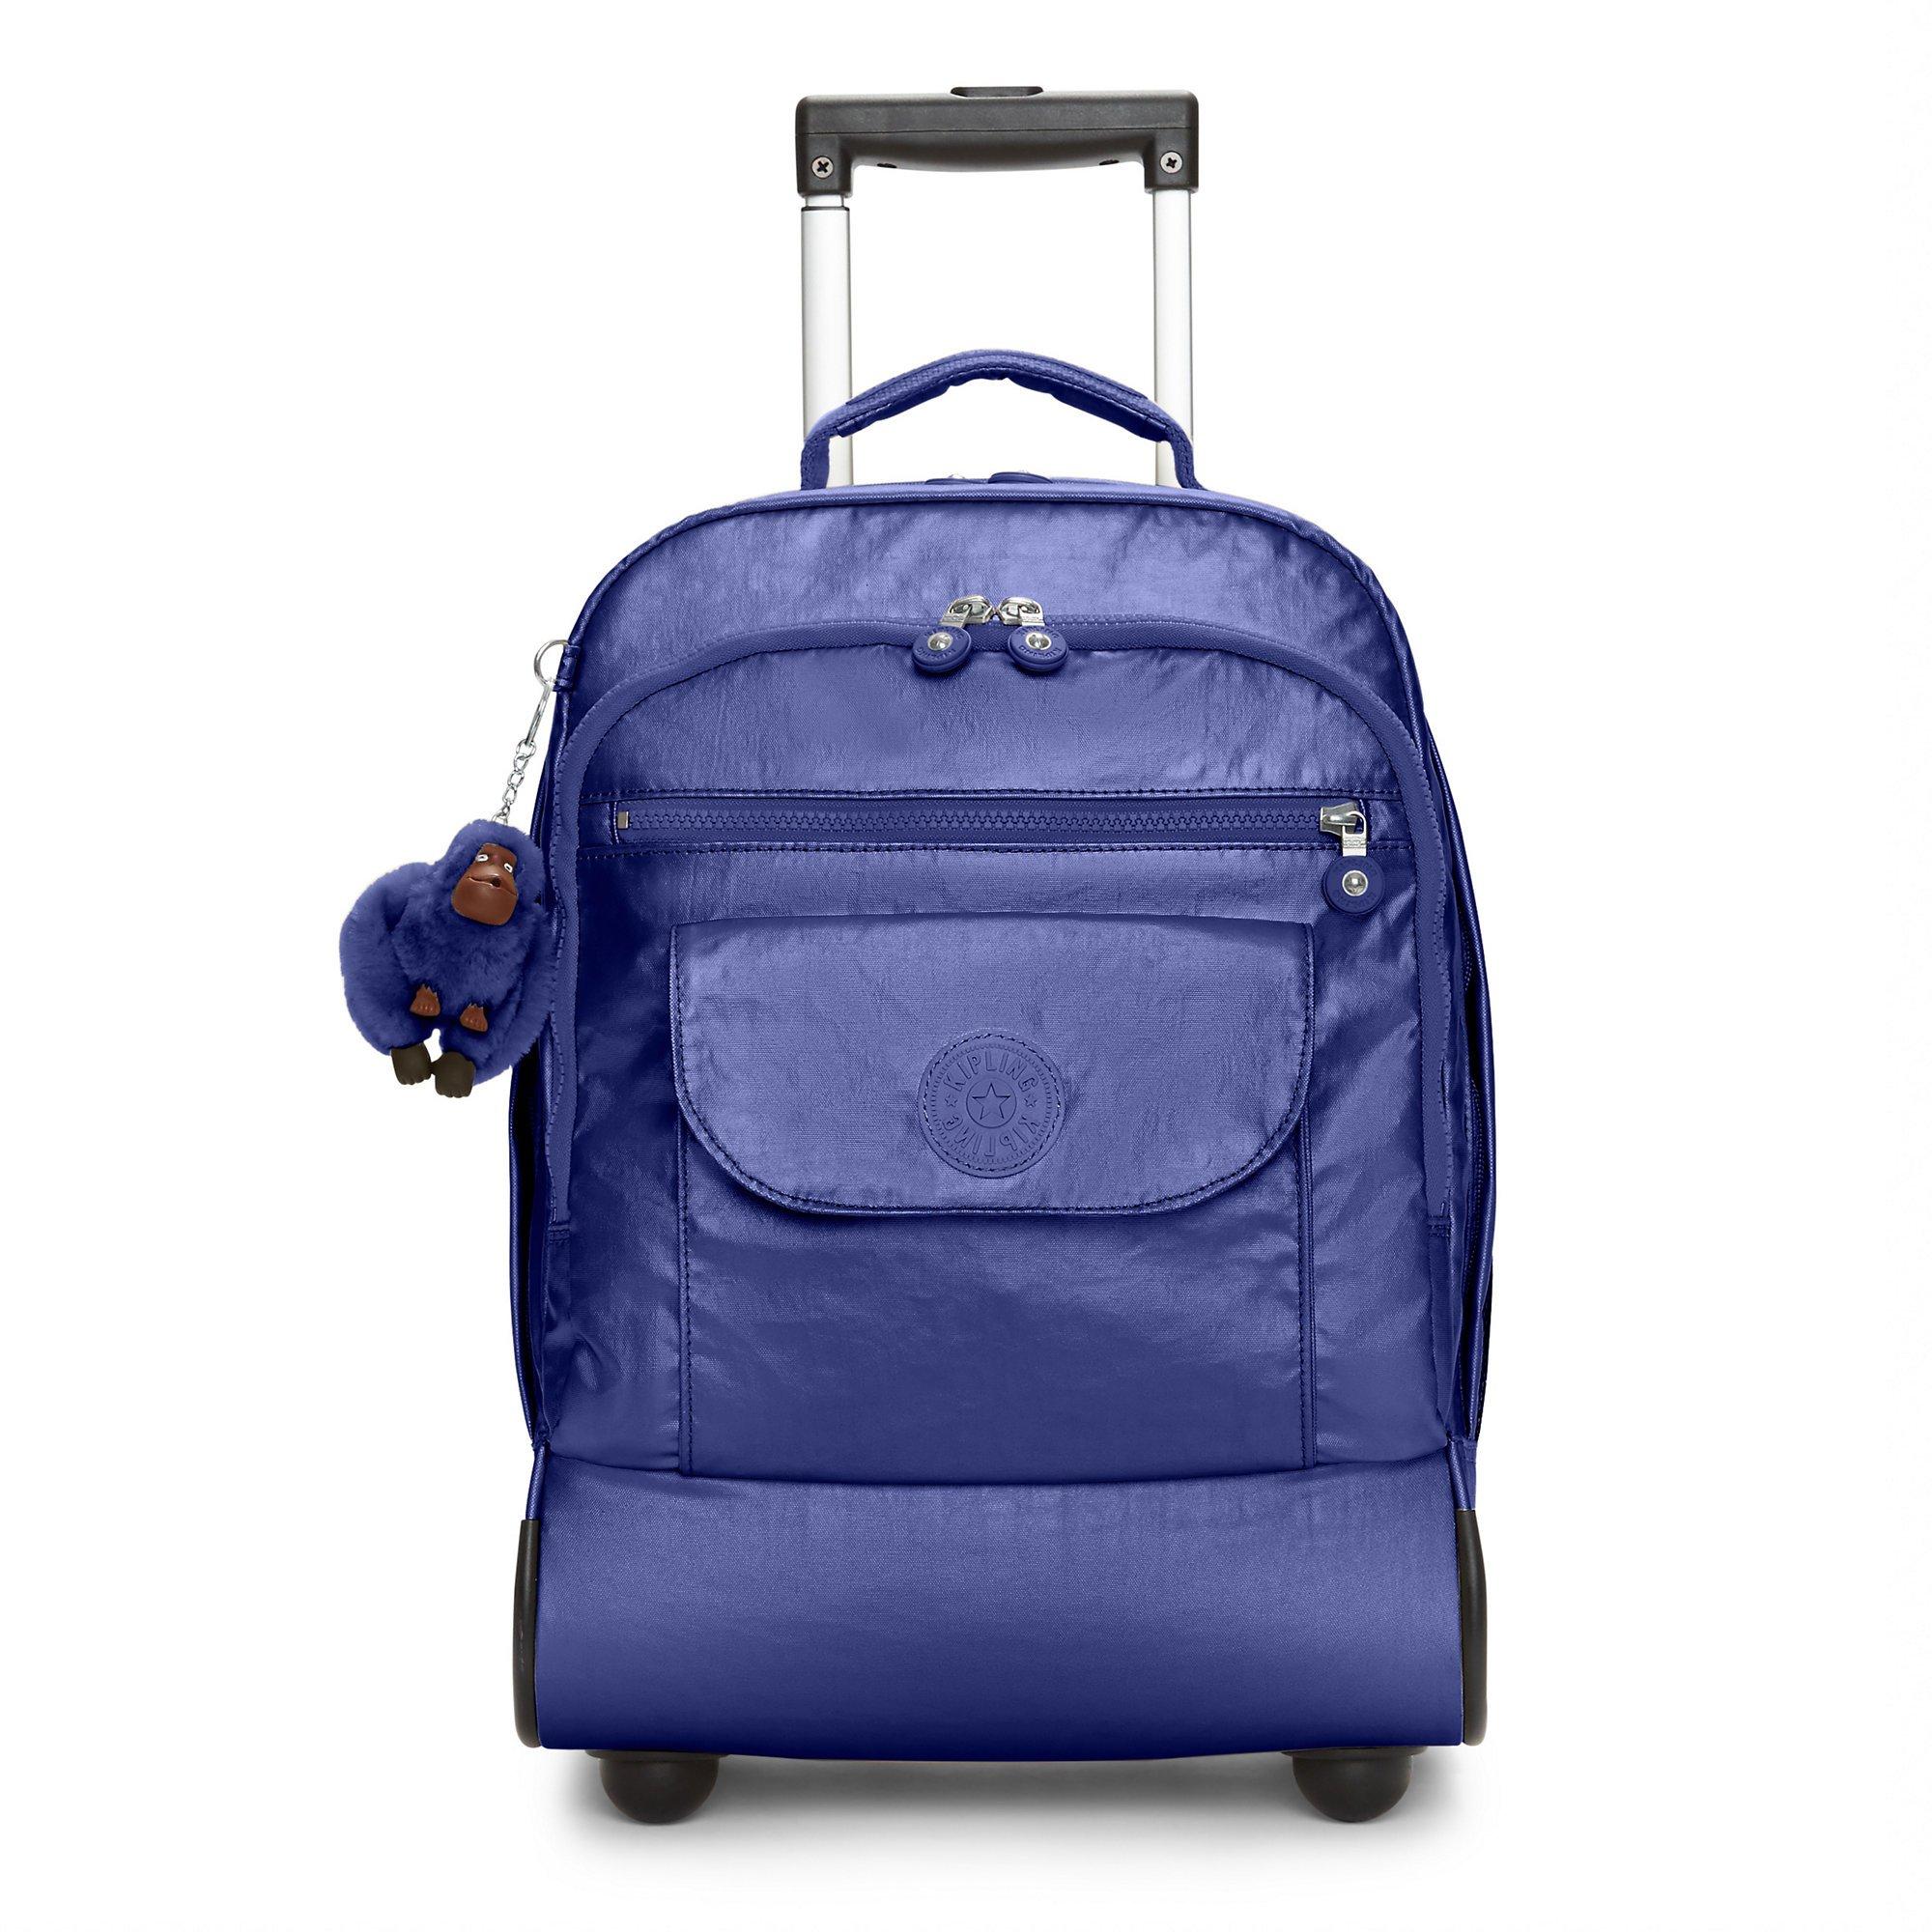 Kipling Women's Sanaa Metallic Rolling Backpack One Size Enchanted Purple Metallic by Kipling